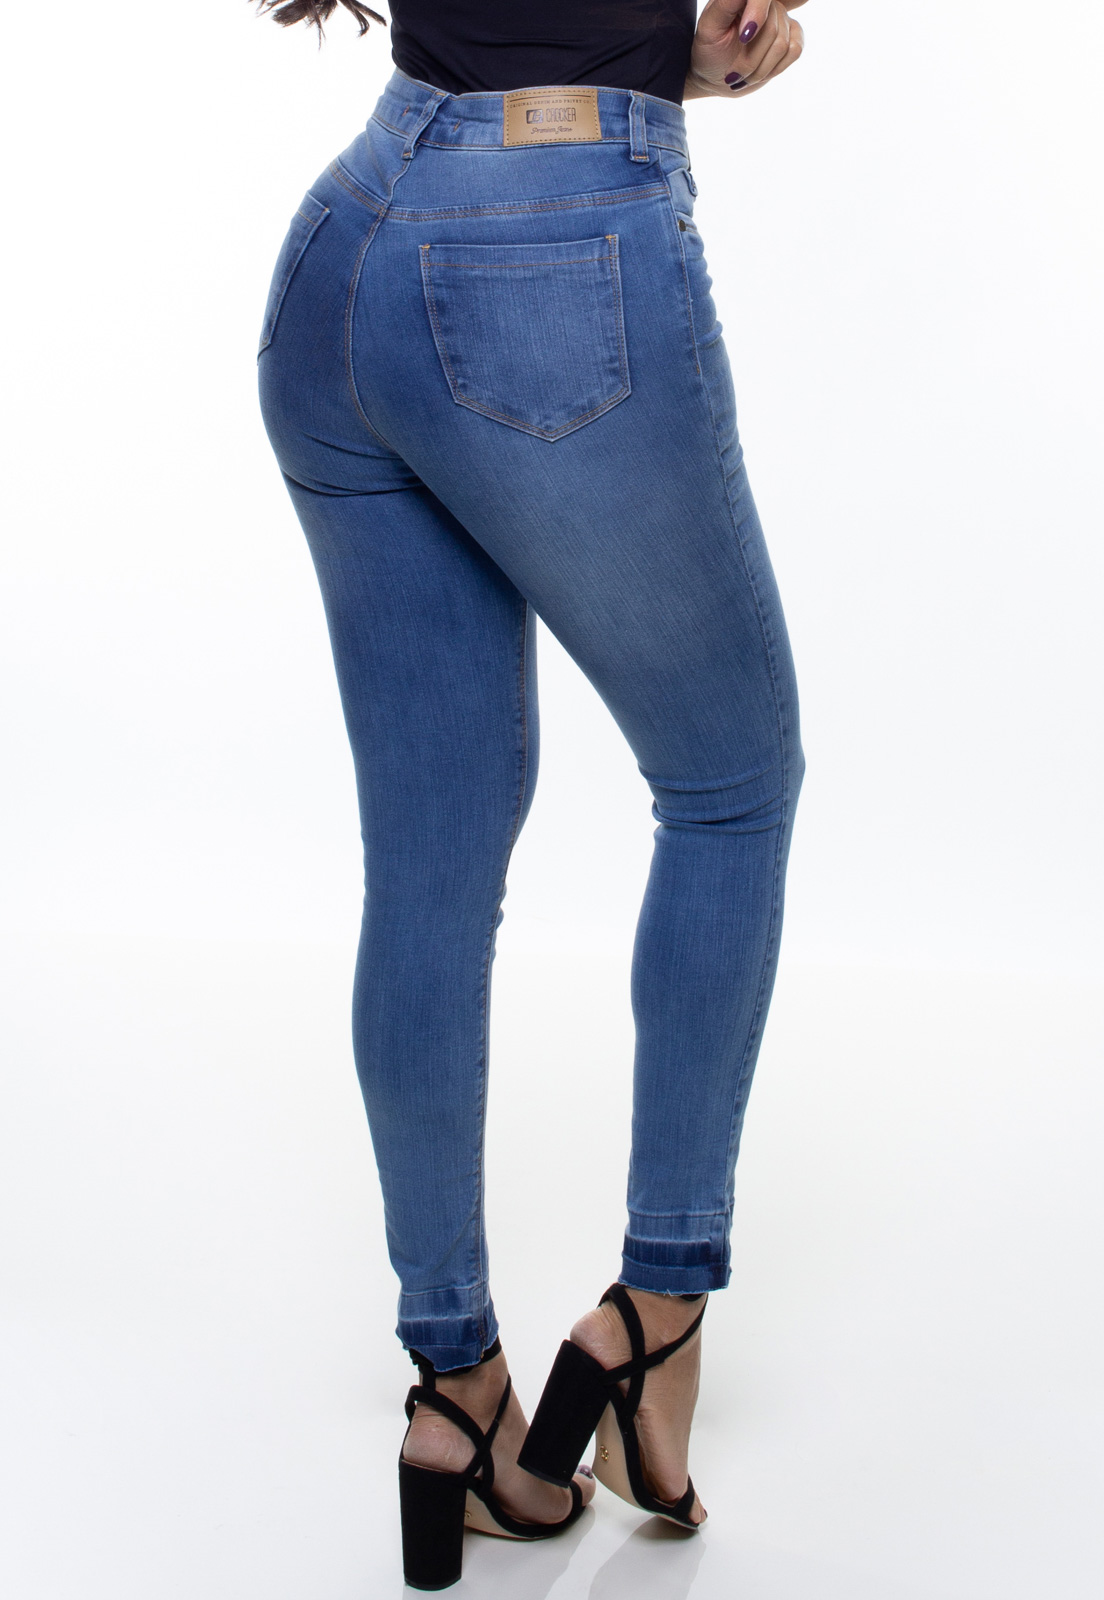 Calça  Jeans Feminina Crocker - 48059  - CROCKER JEANS